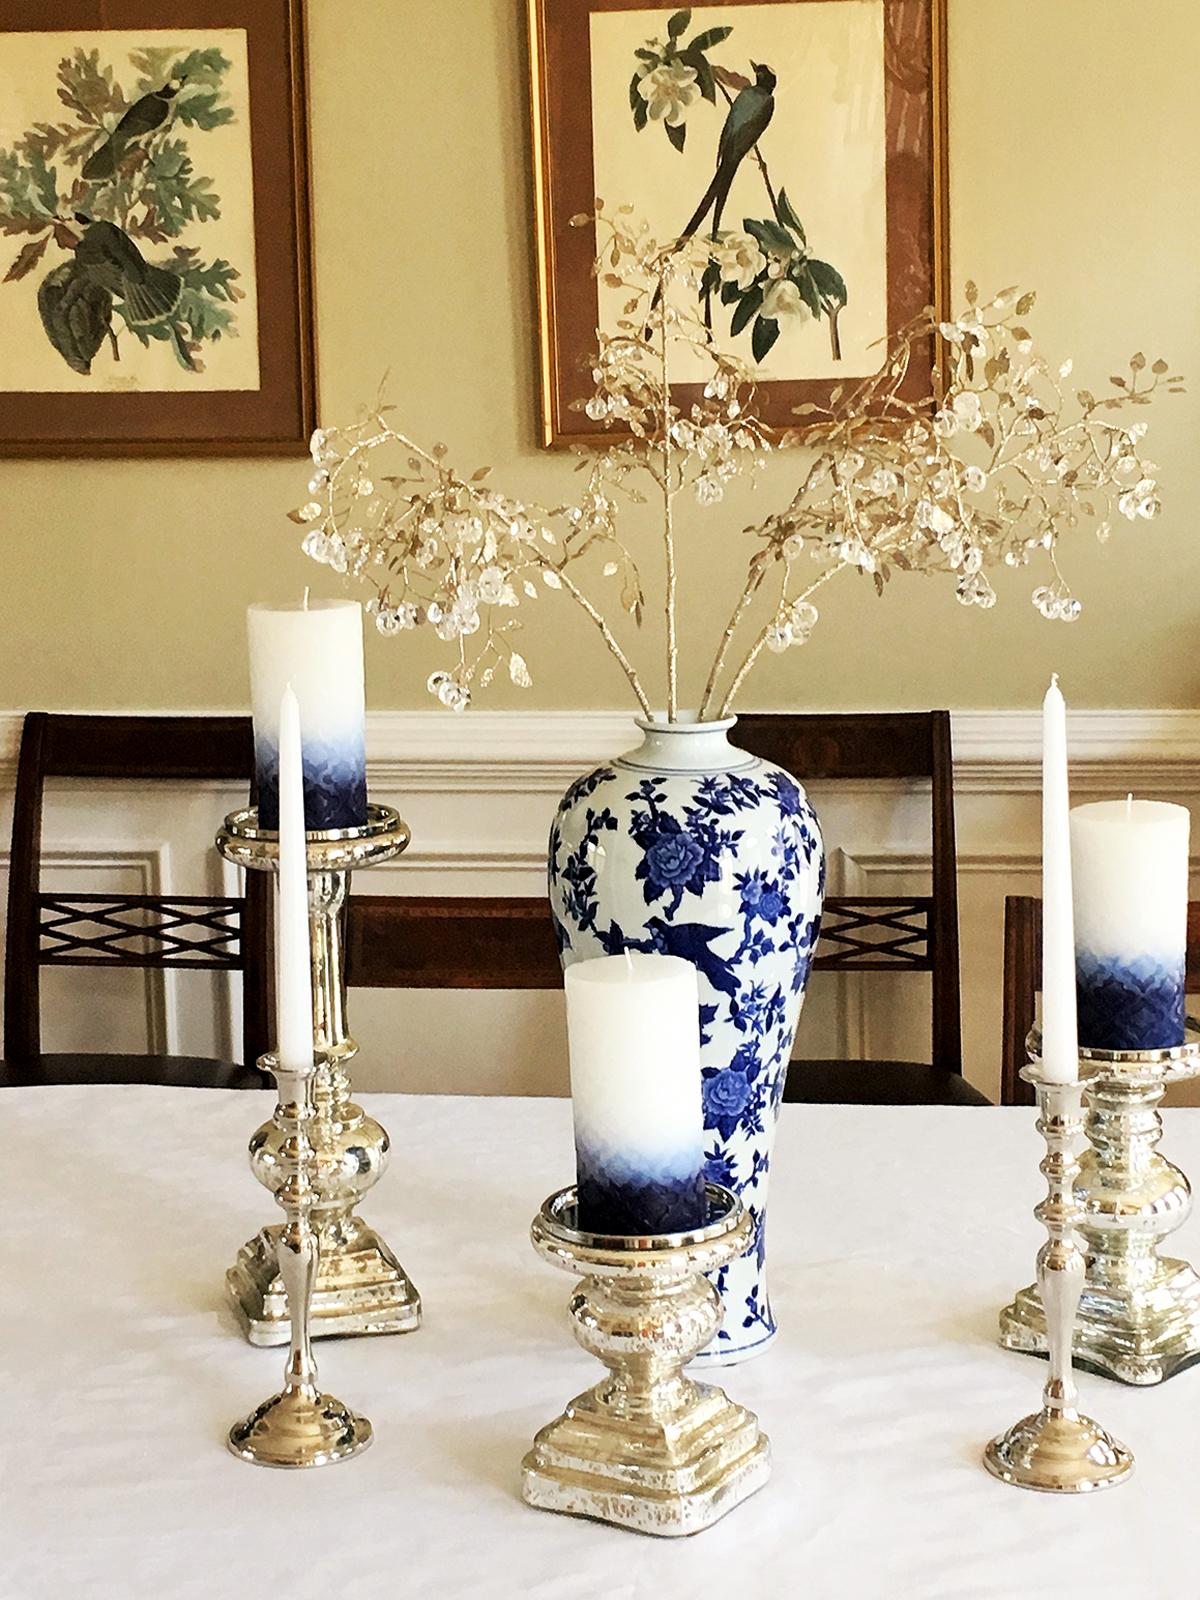 Dining-room-redesign-1-bk-designs-Atlanta-GA.jpg